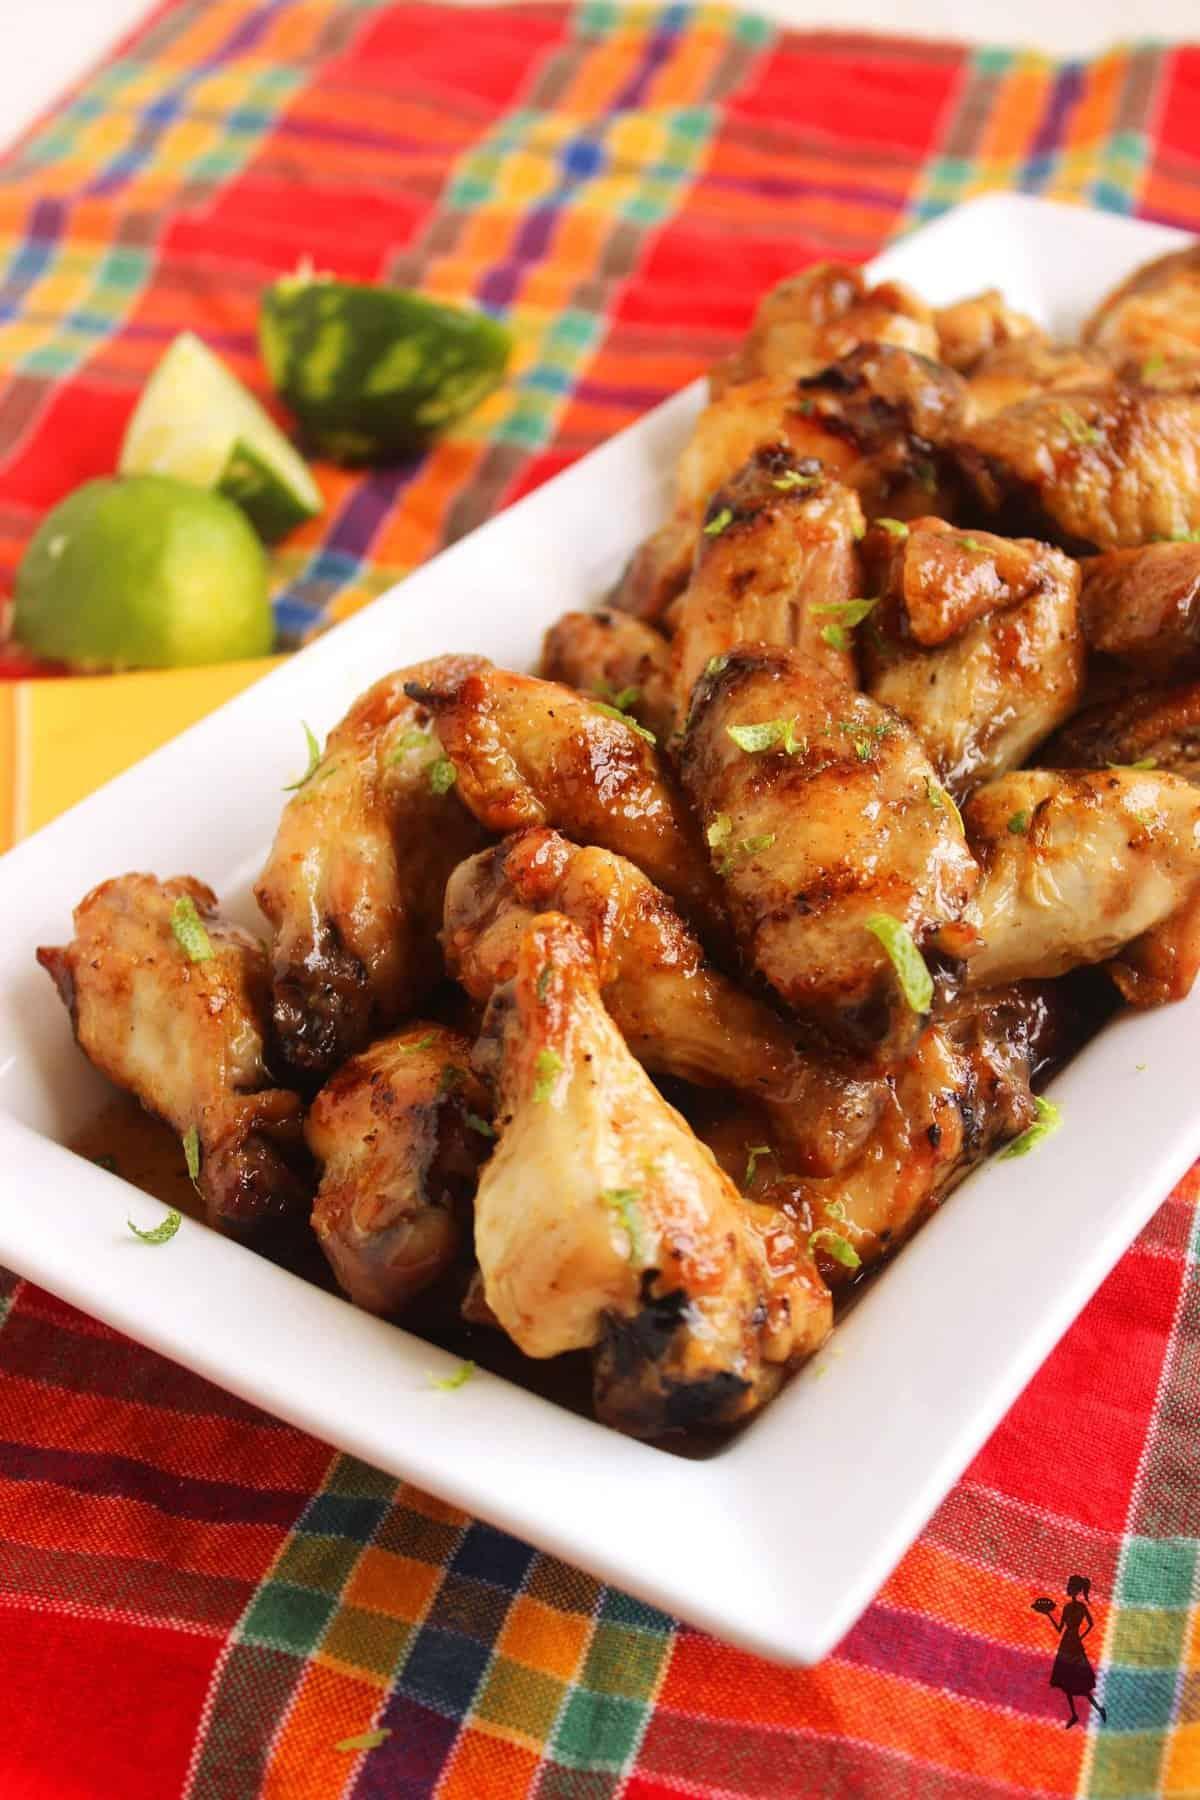 Grilled Honey-Habanero Chicken Wings